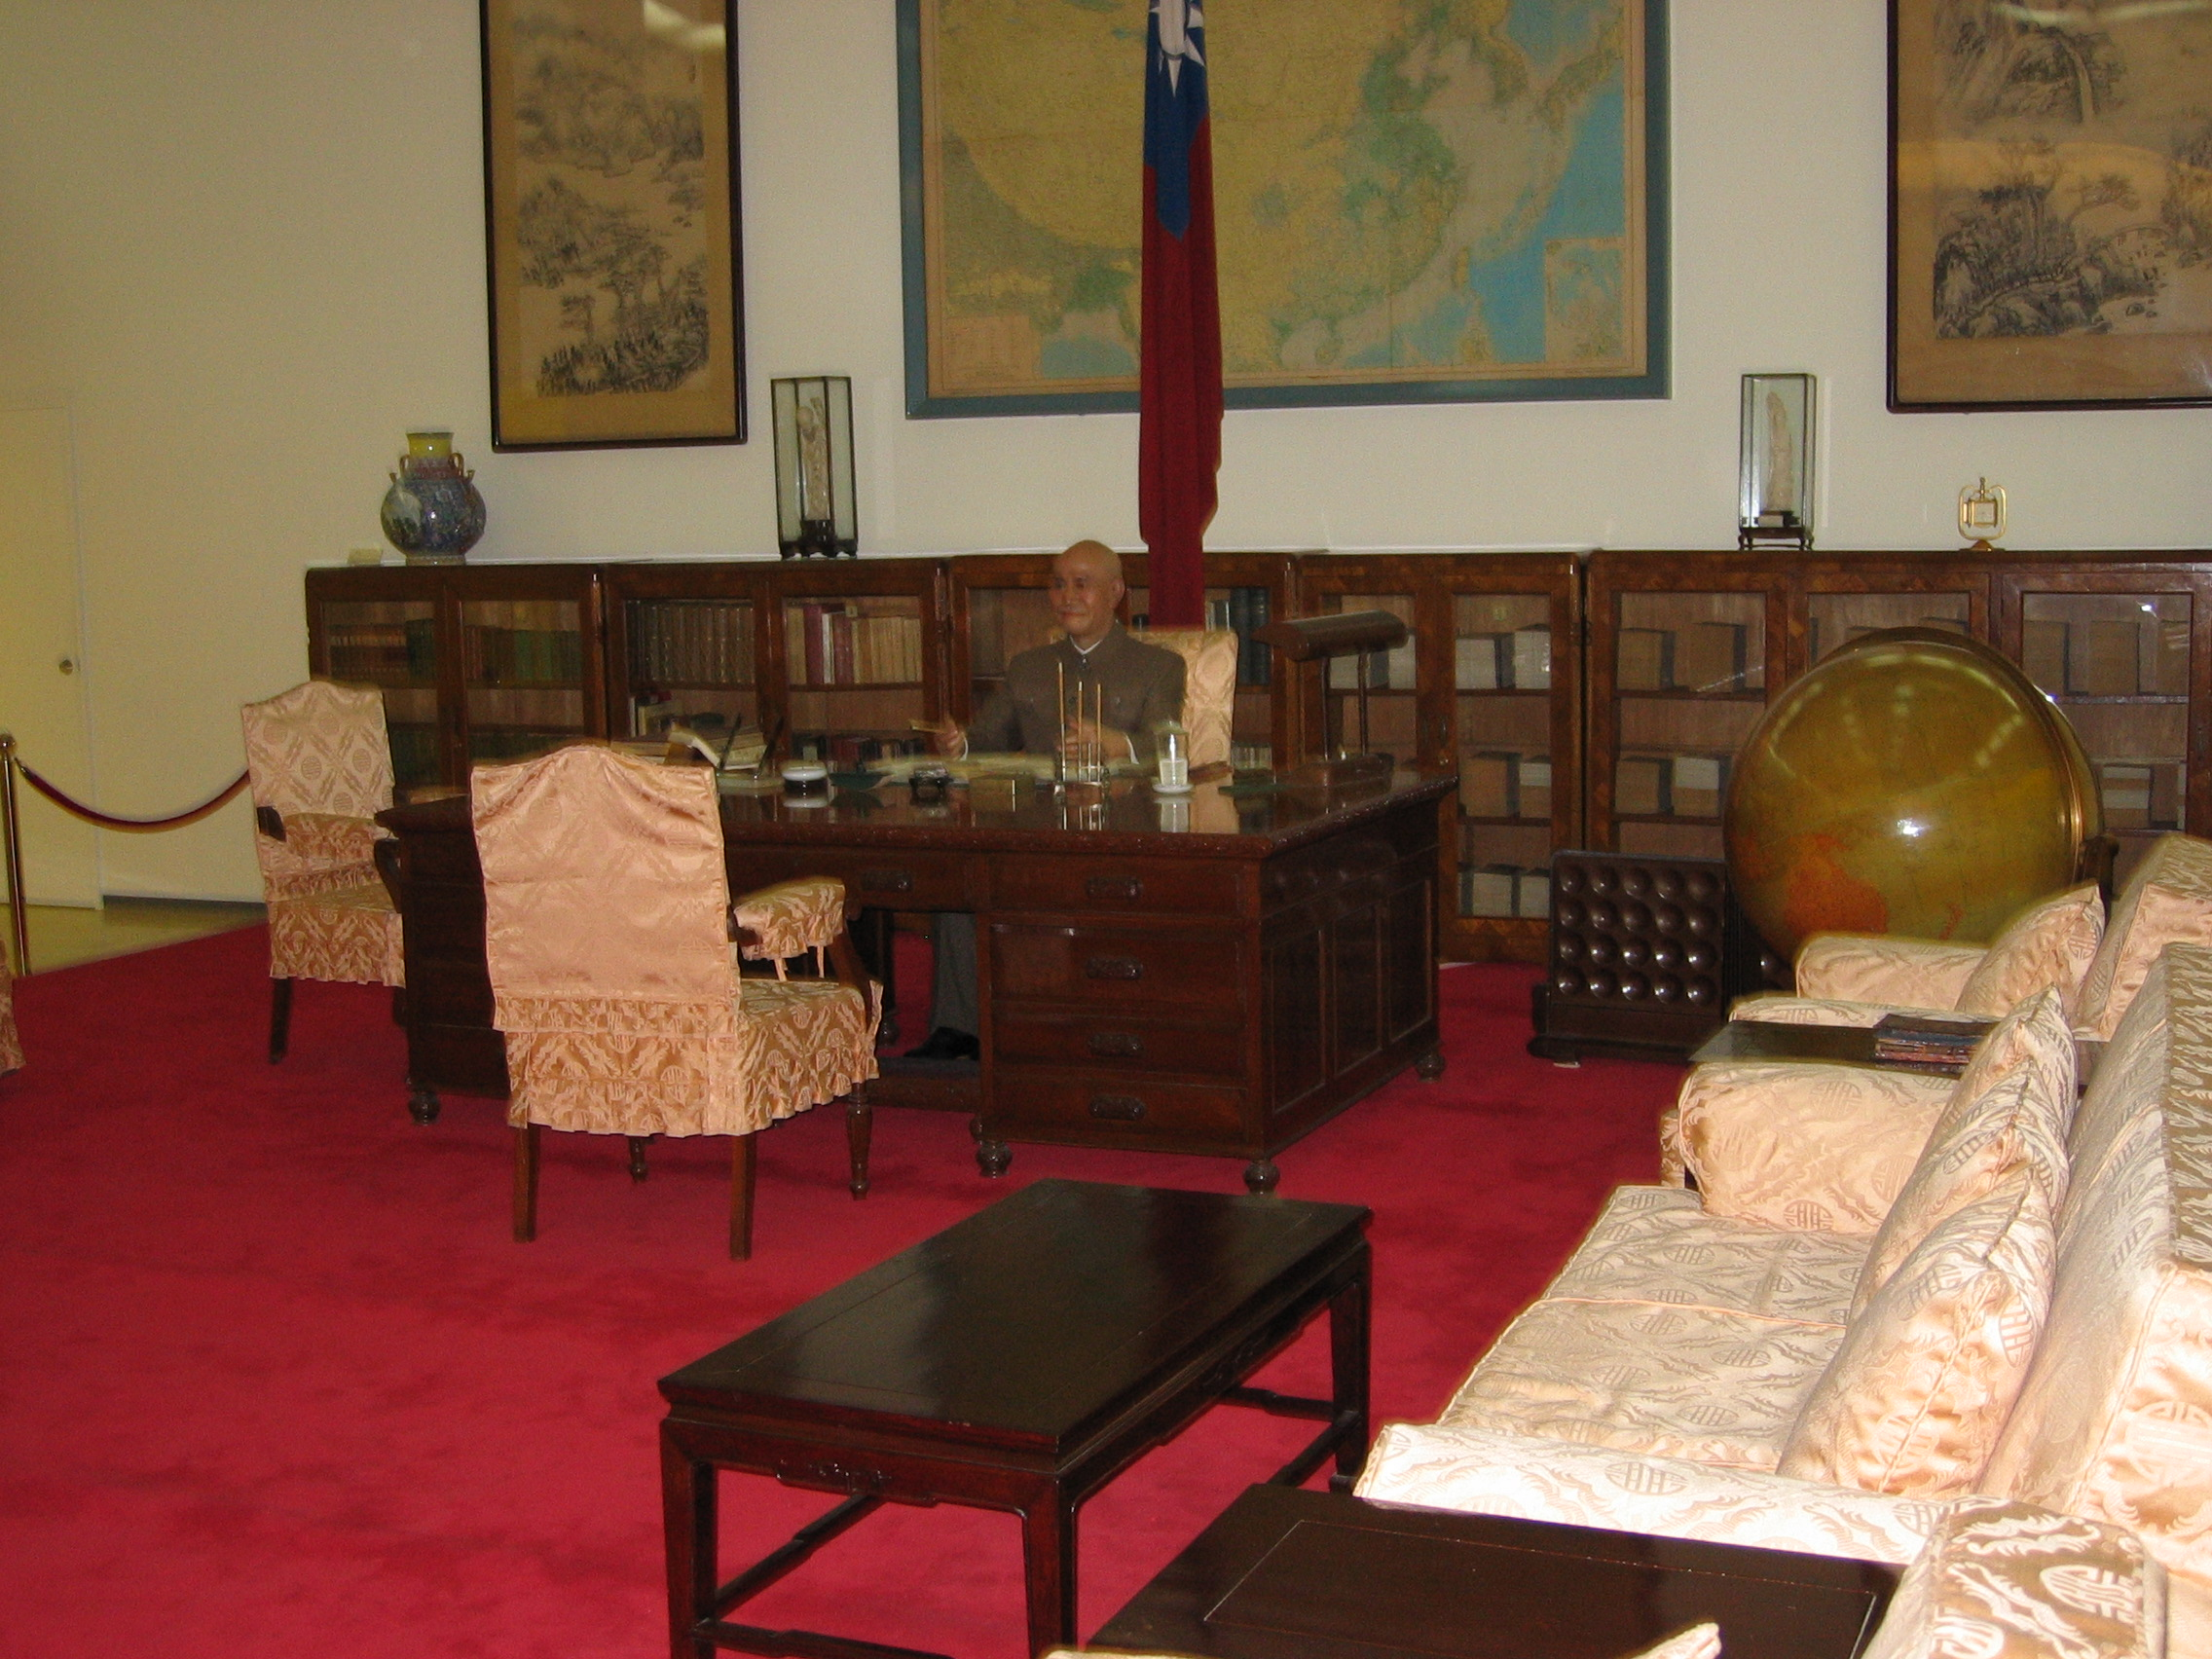 File:ROC CKSMH The Memorial Office Of President Chiang 20050529